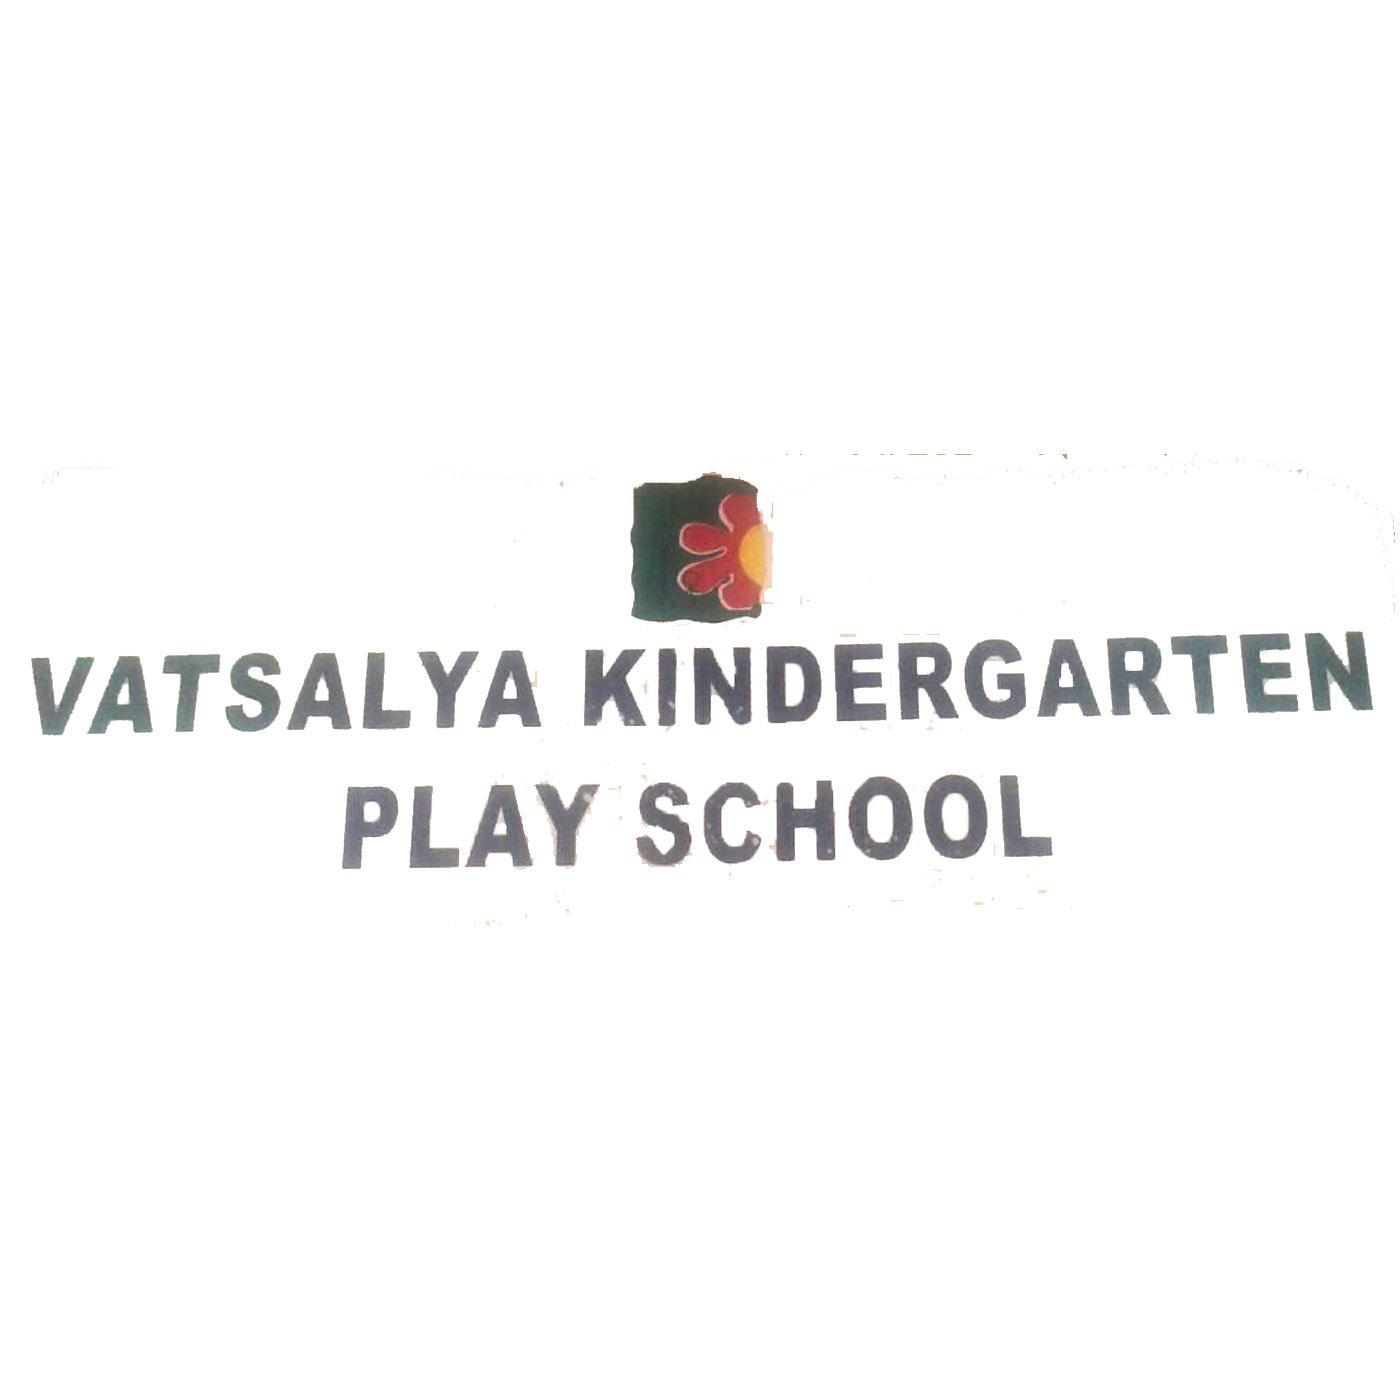 Vatsalya KinderGarten, Vatsalya Kindergarten